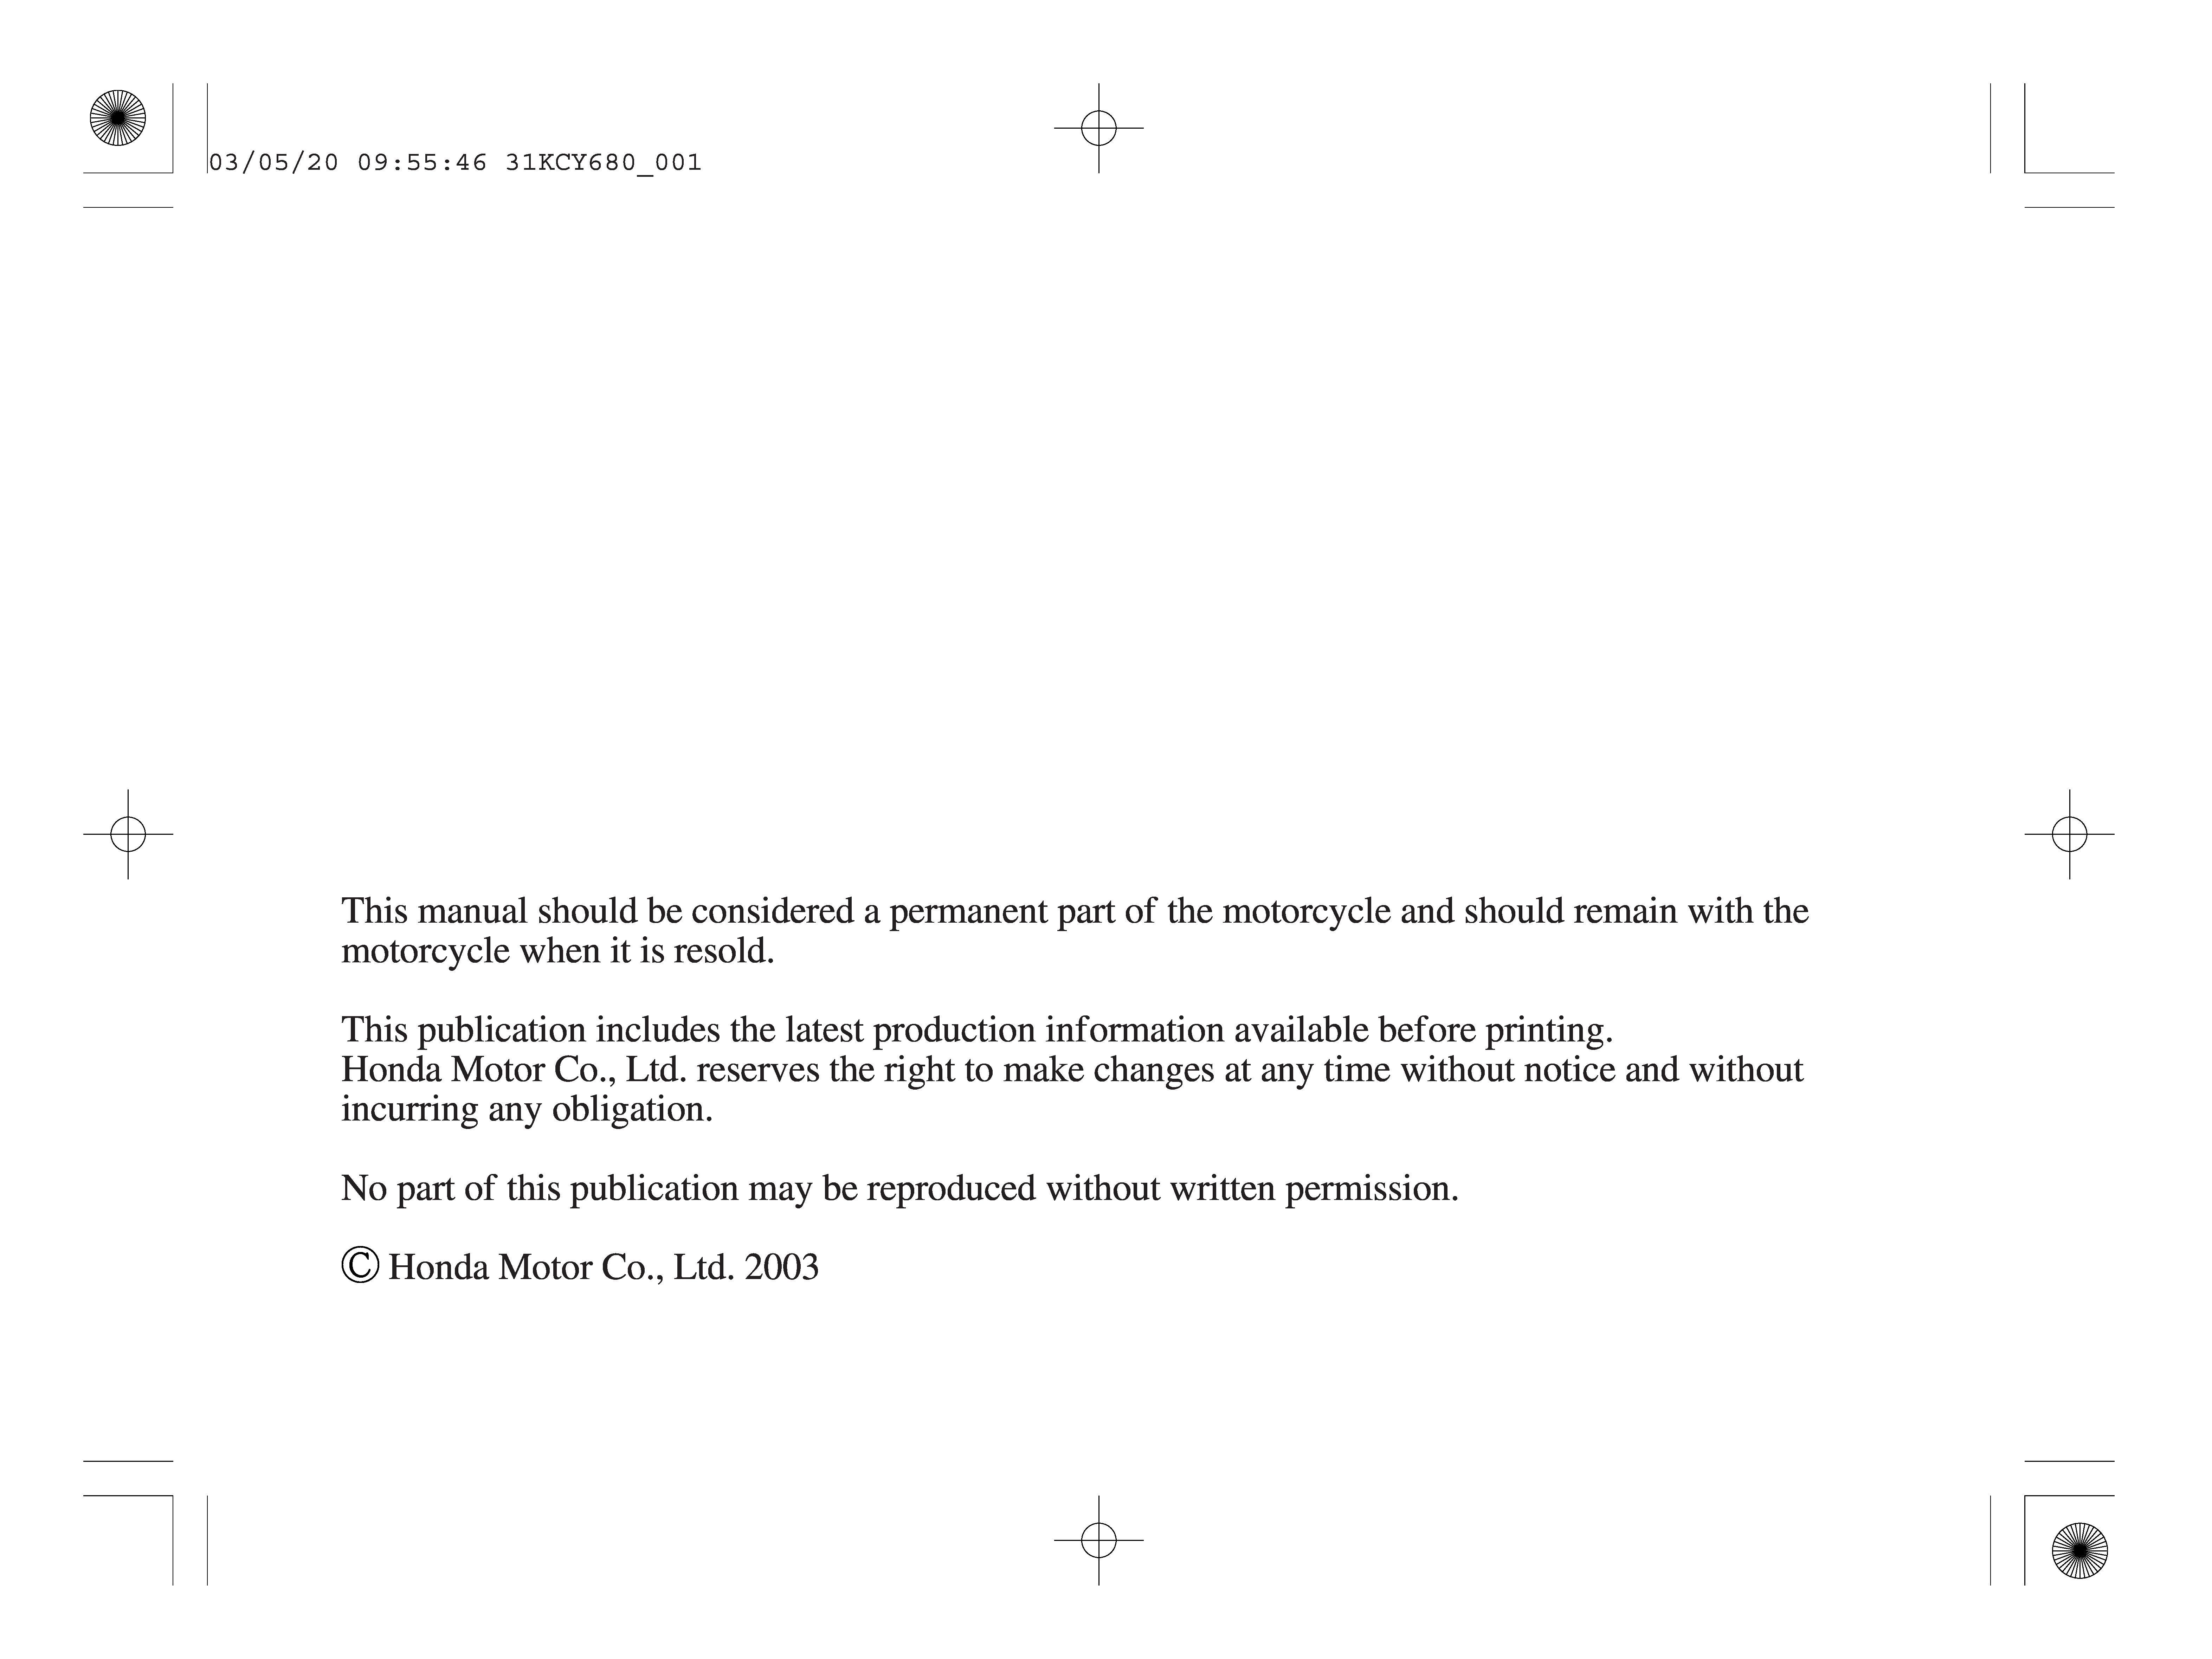 Owner's manual for Honda XR400 (2004)